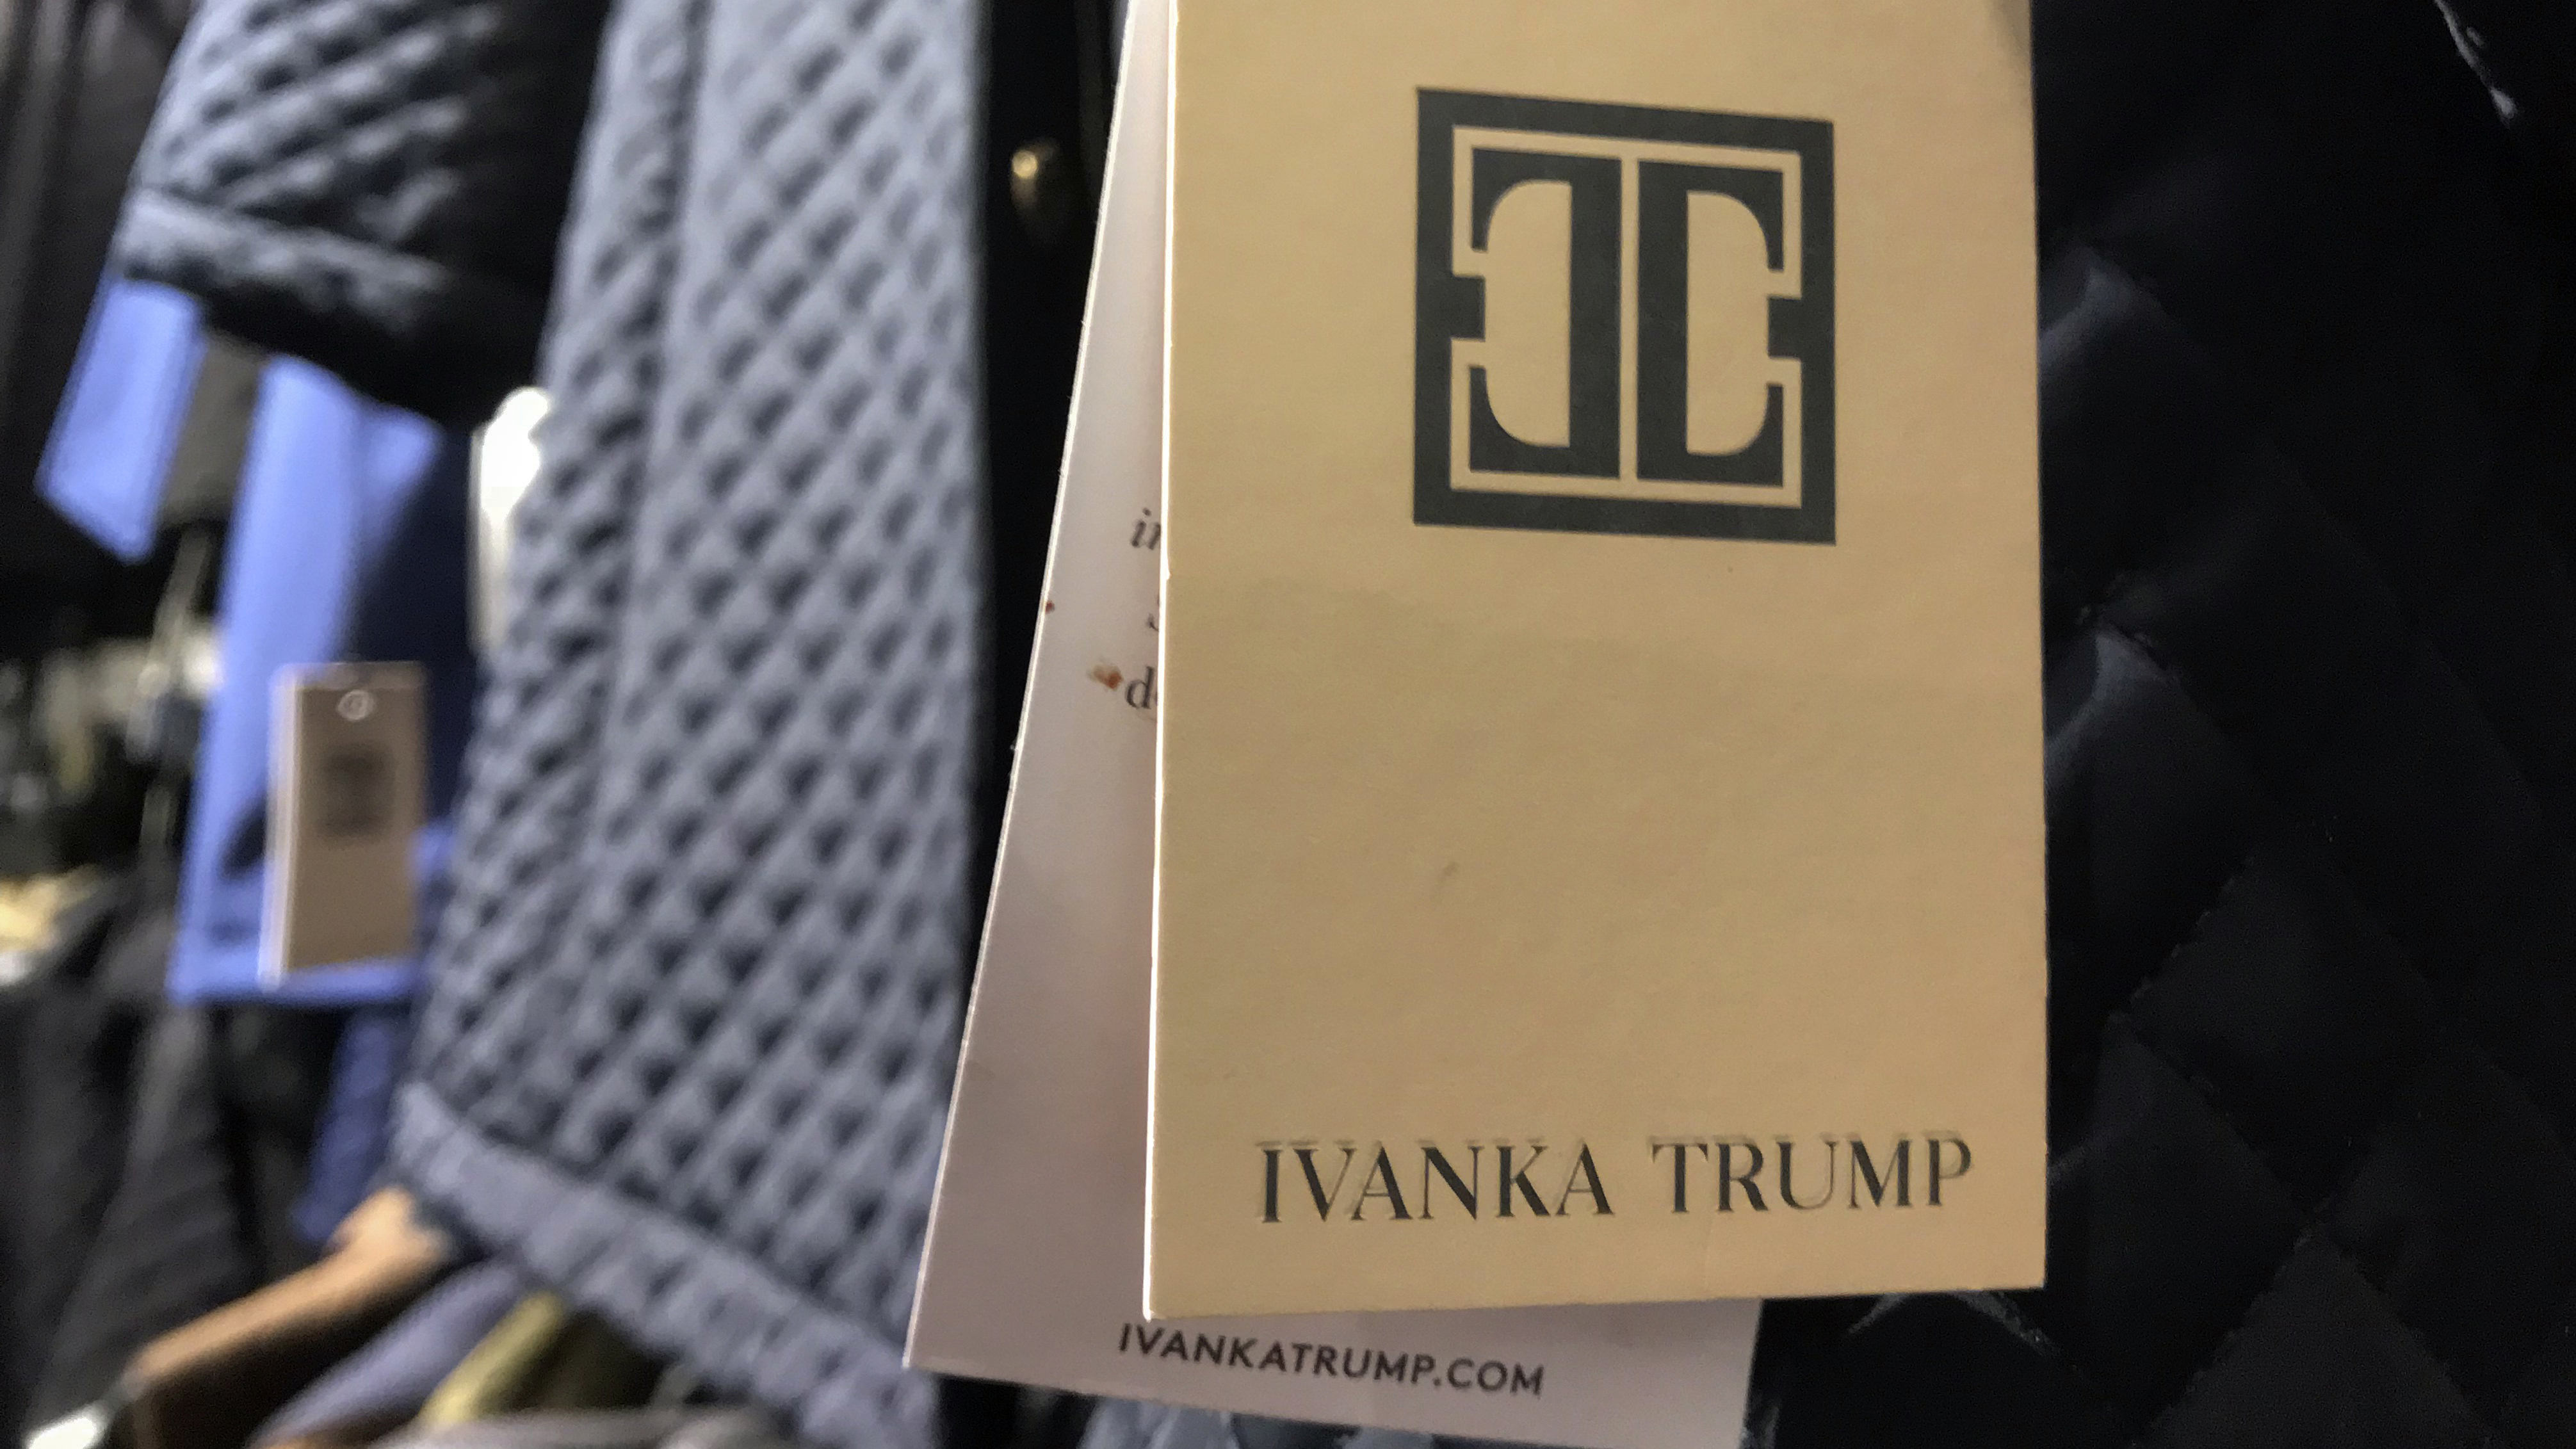 b6112cc454d Ivanka Trump  Family separations a low point - CNN Video